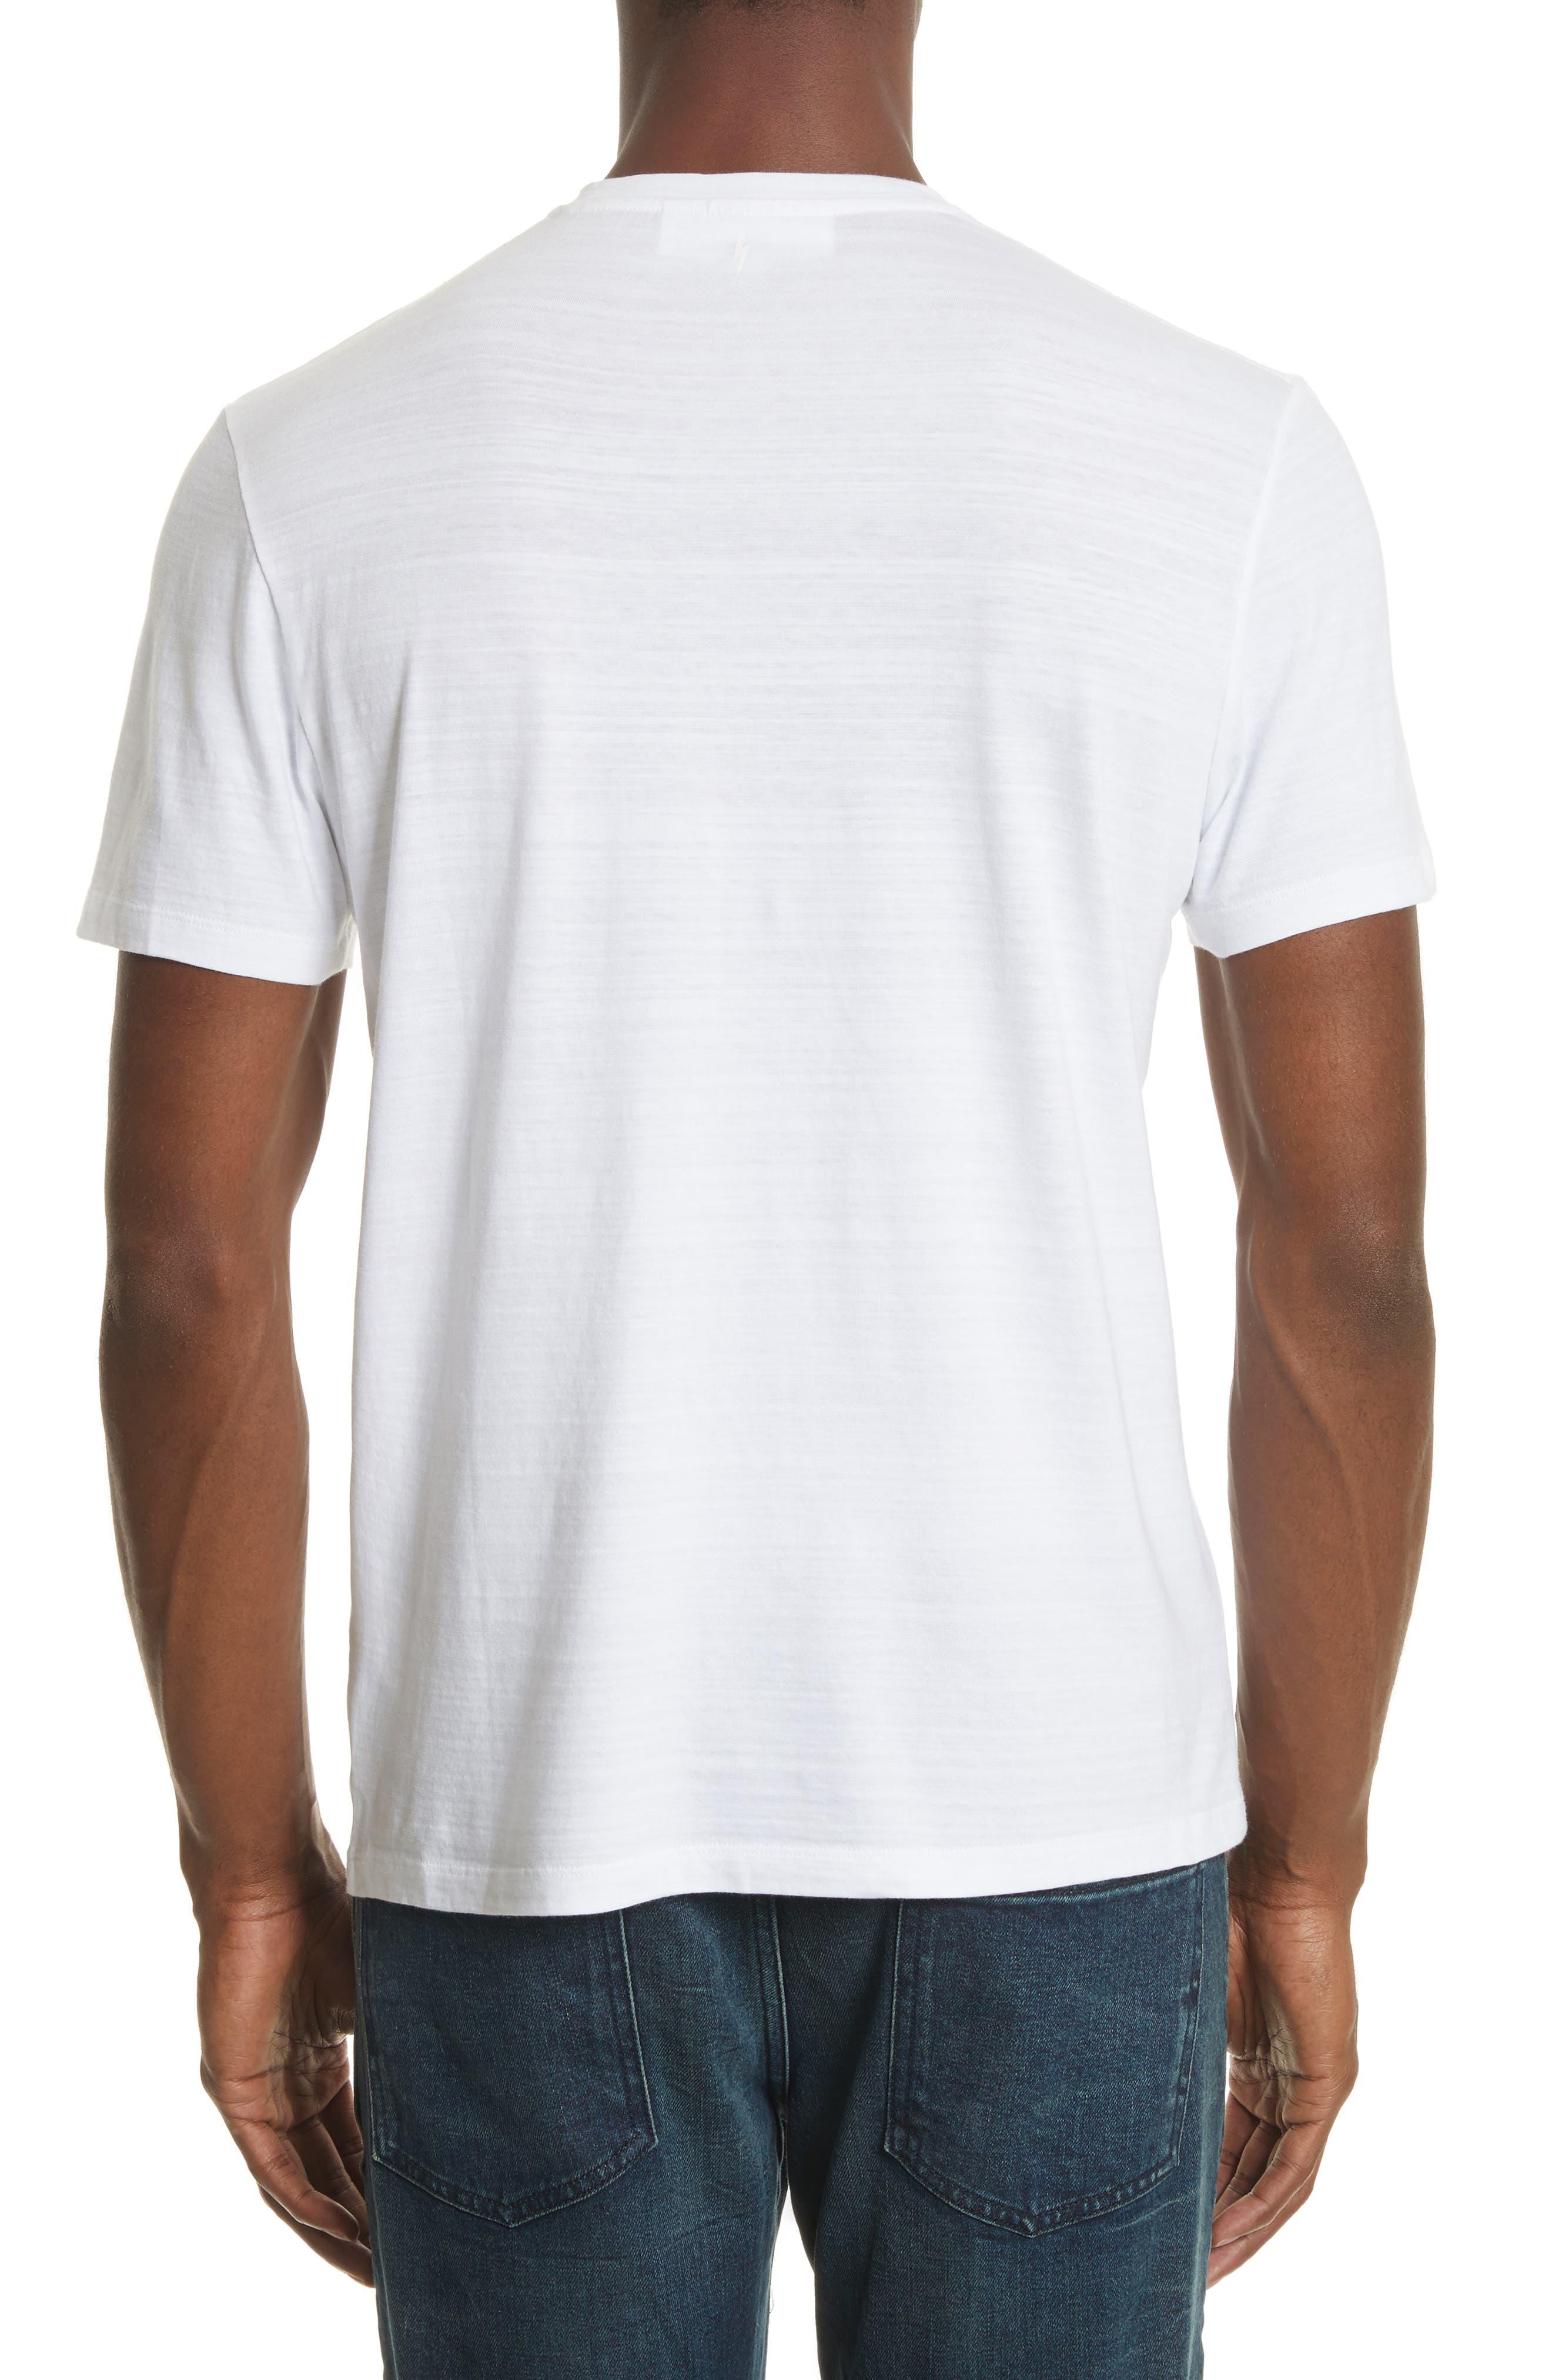 Thunderbolt Graphic T-Shirt,                             Alternate thumbnail 2, color,                             100